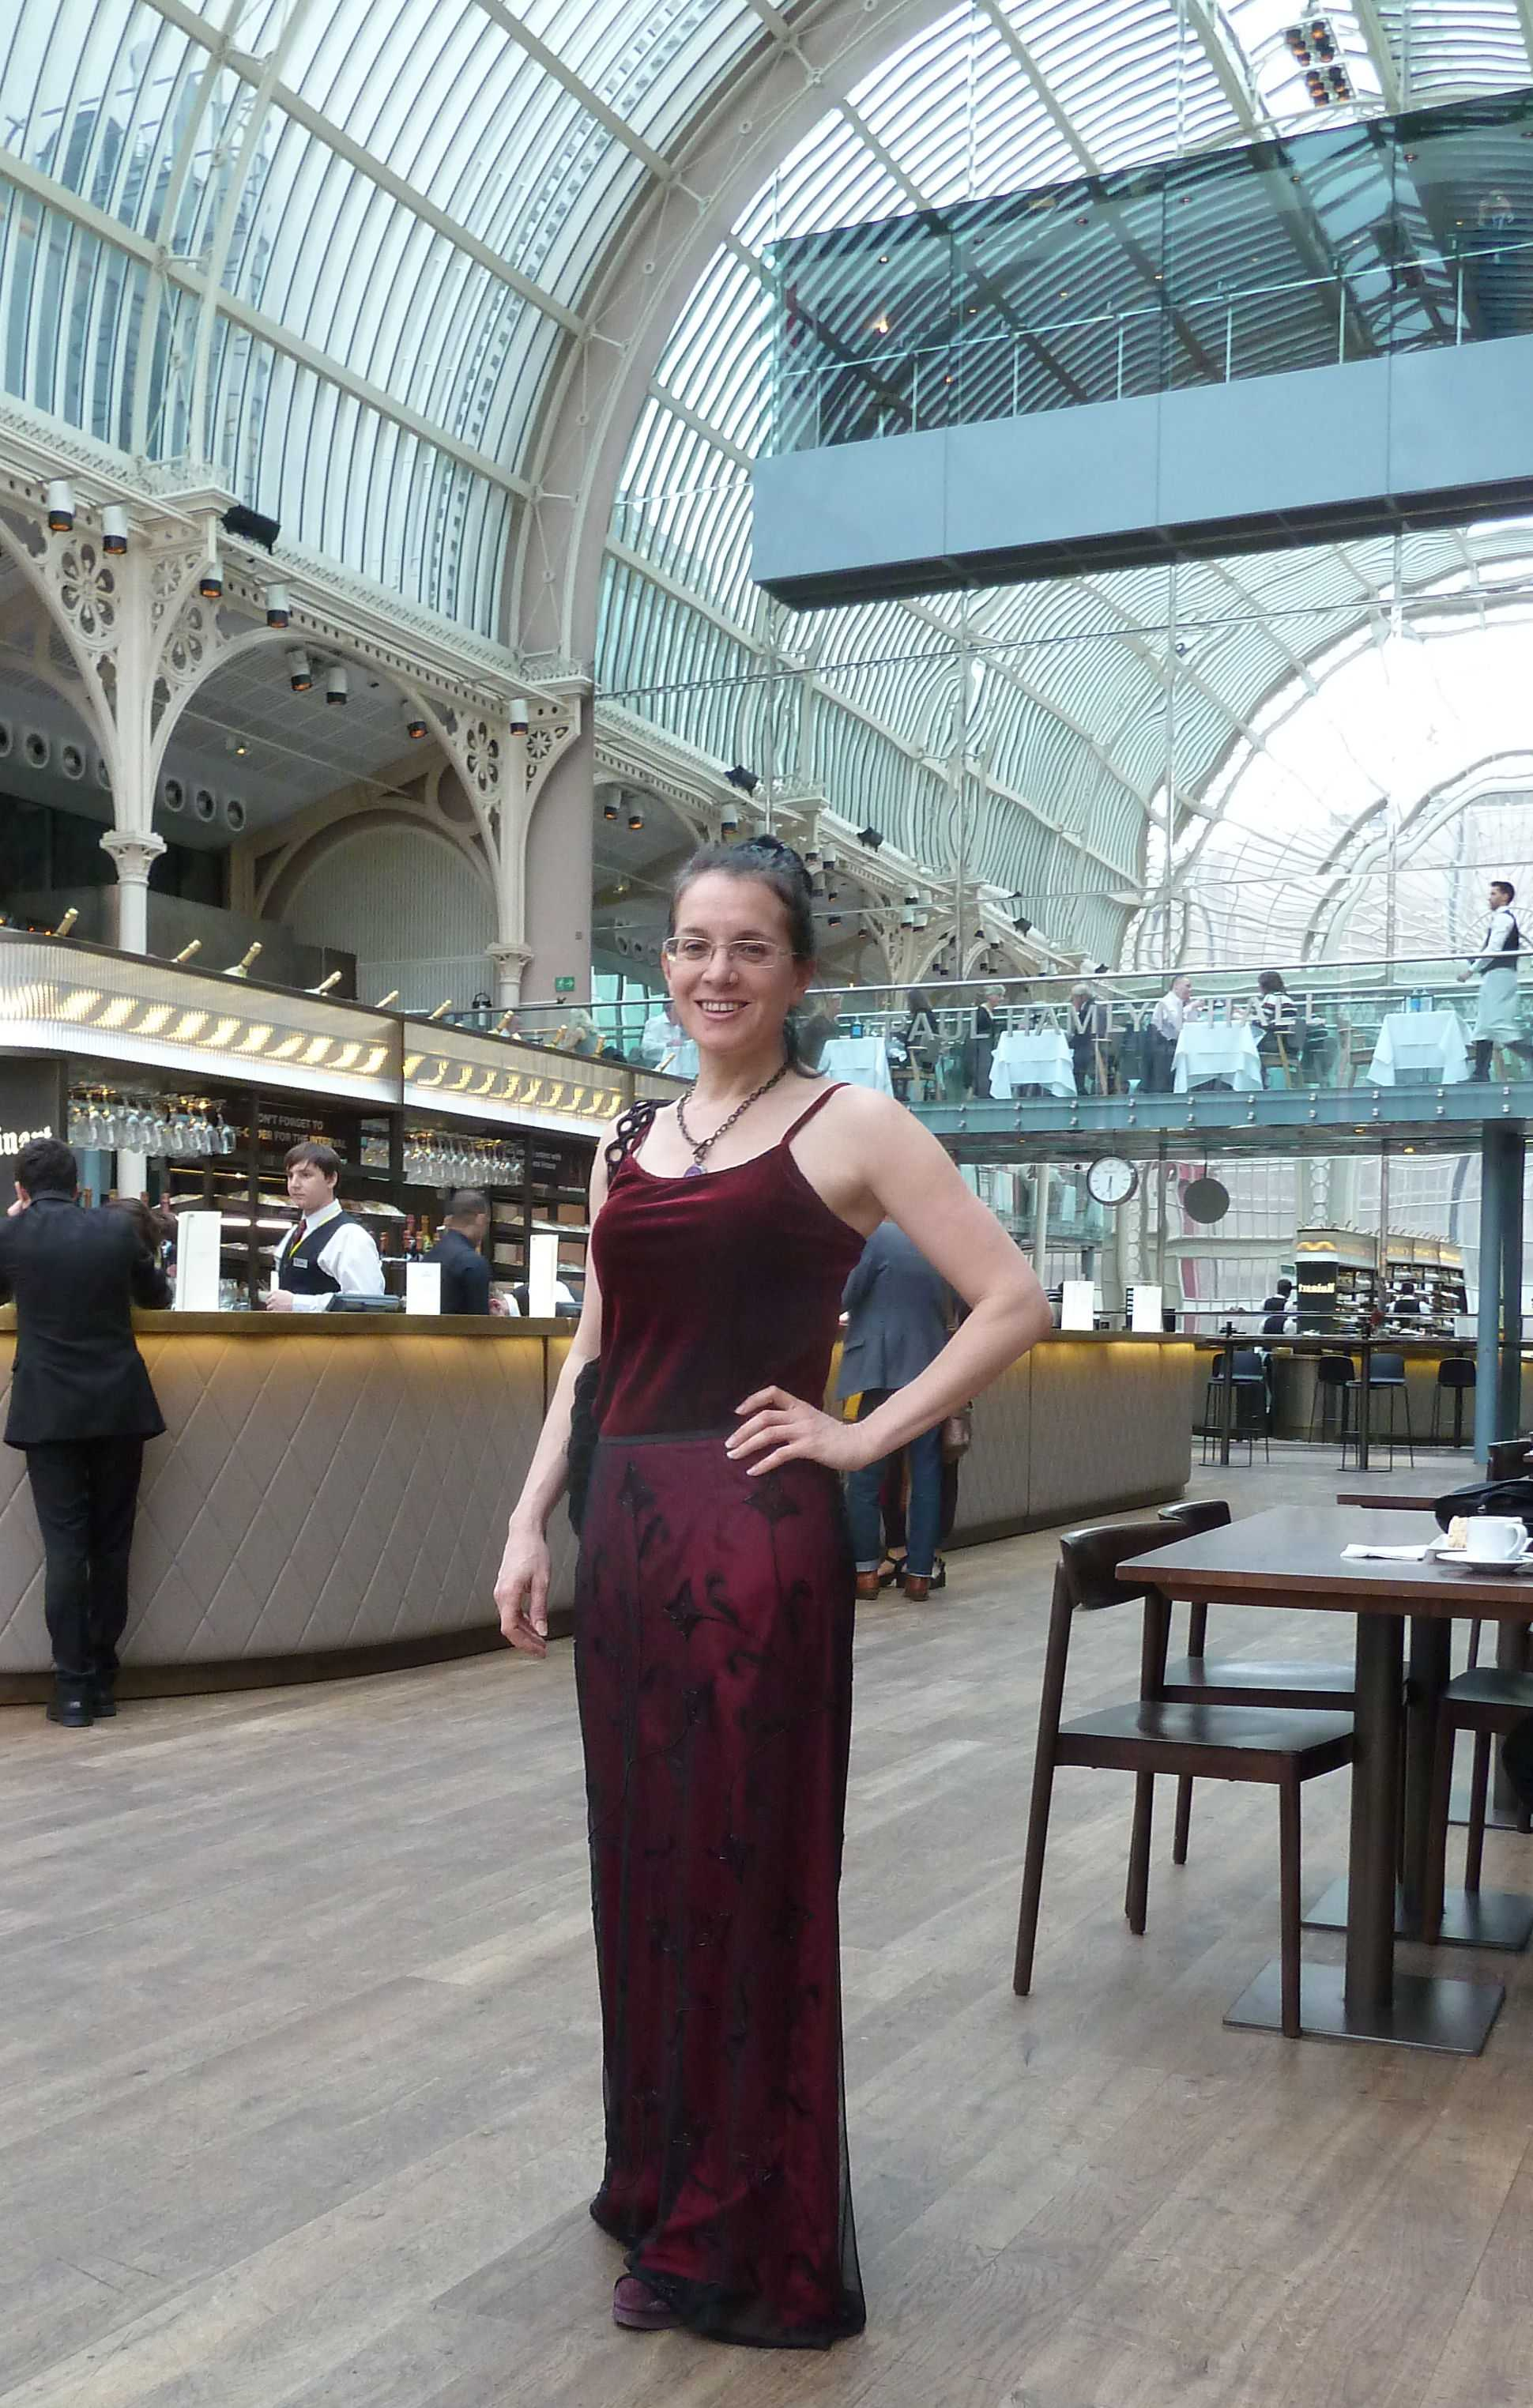 Event Companion photo Debra wearing burgundy floor-length evening dress at the Royal Opera House